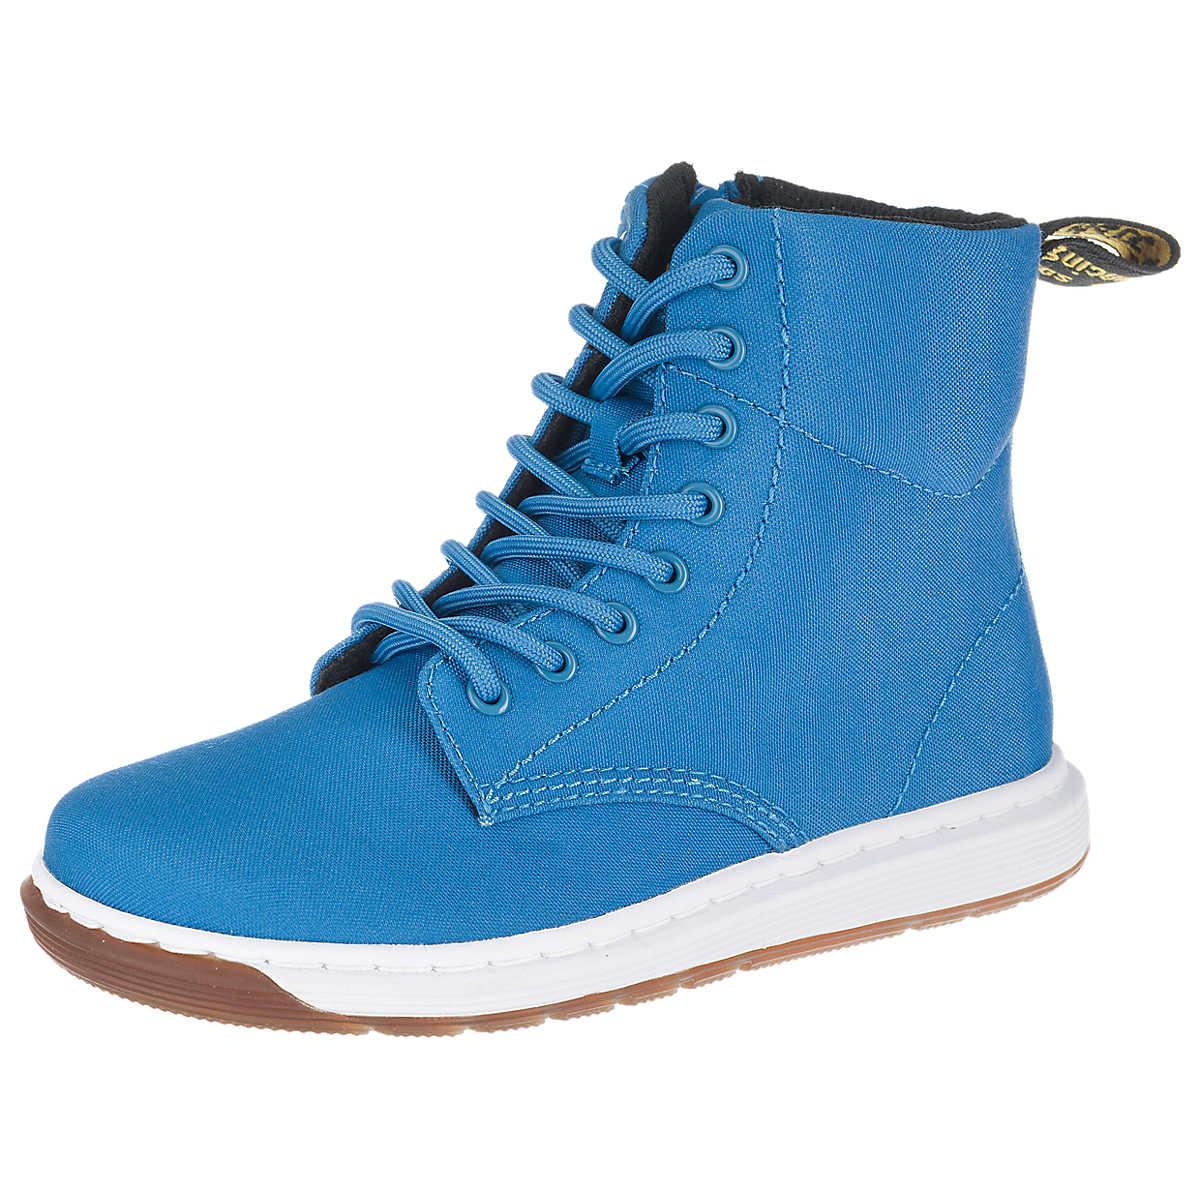 Stiefel MALKY f�¼r Jungen blau - Dr. Martens - Stiefeletten - Schuhe - mirapodo.de